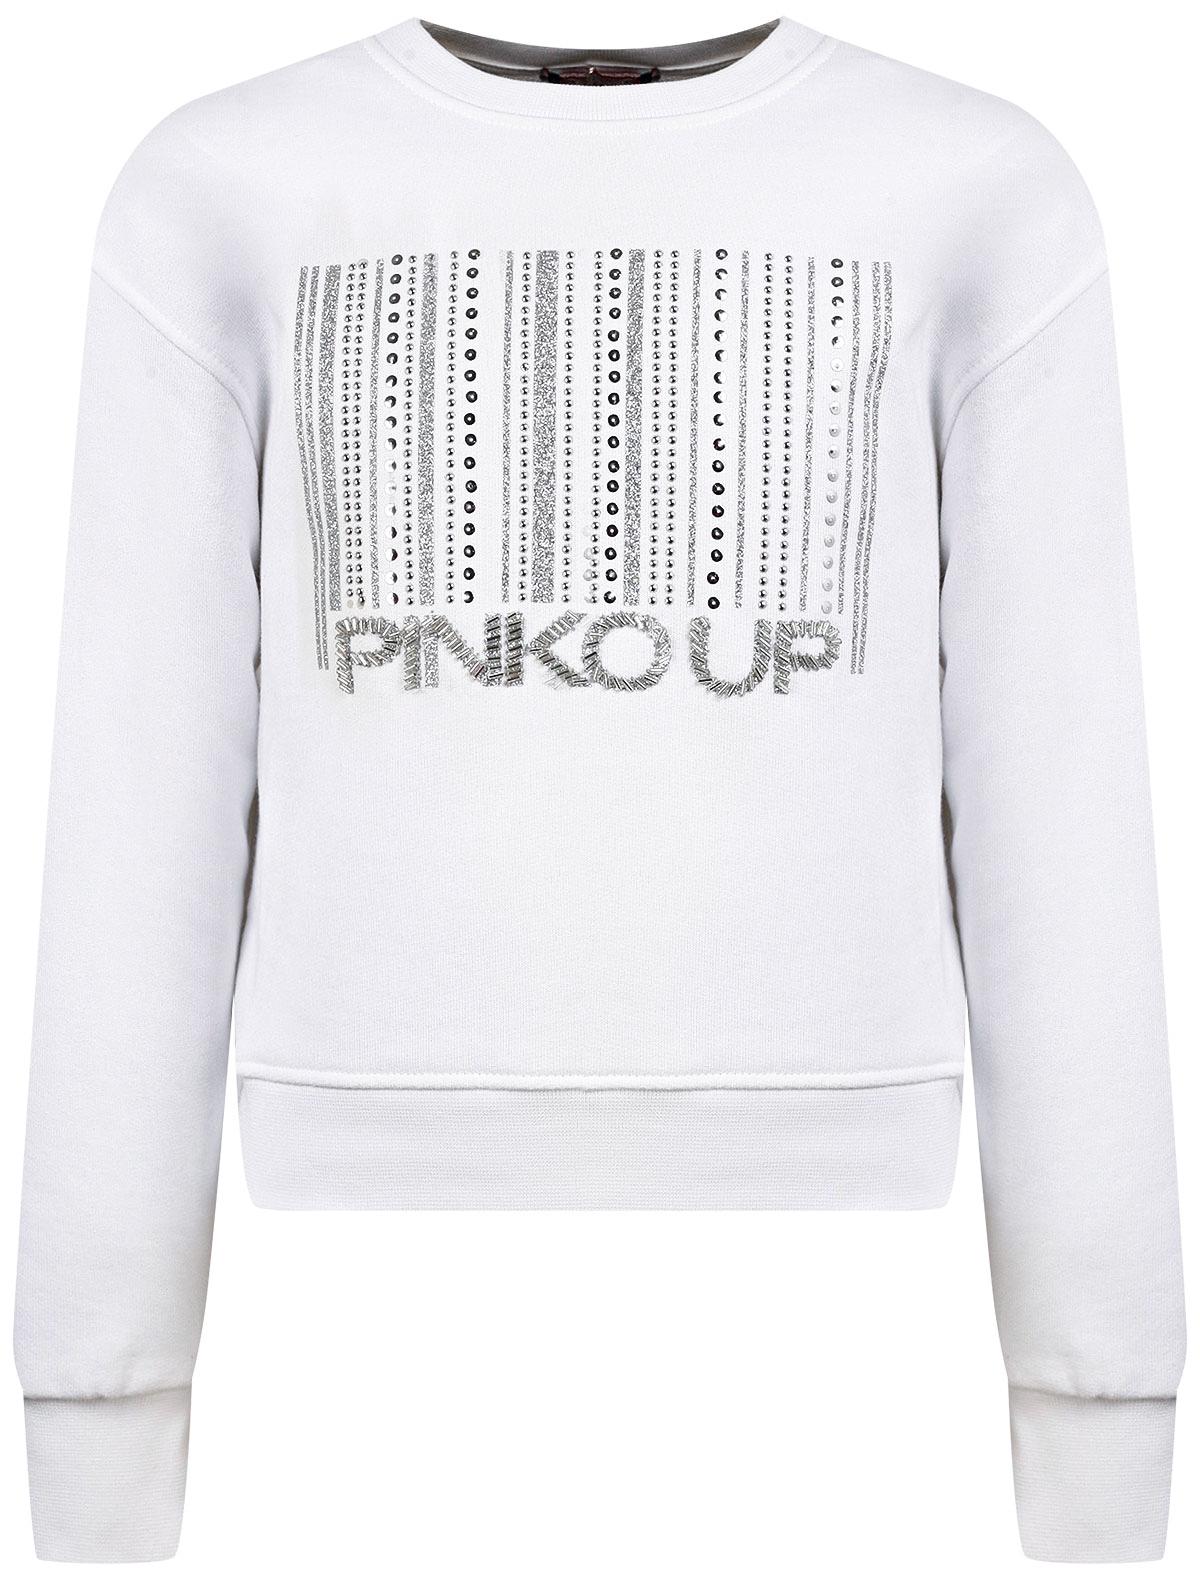 2275952, Свитшот Pinko Up, белый, Женский, 0084509171195  - купить со скидкой